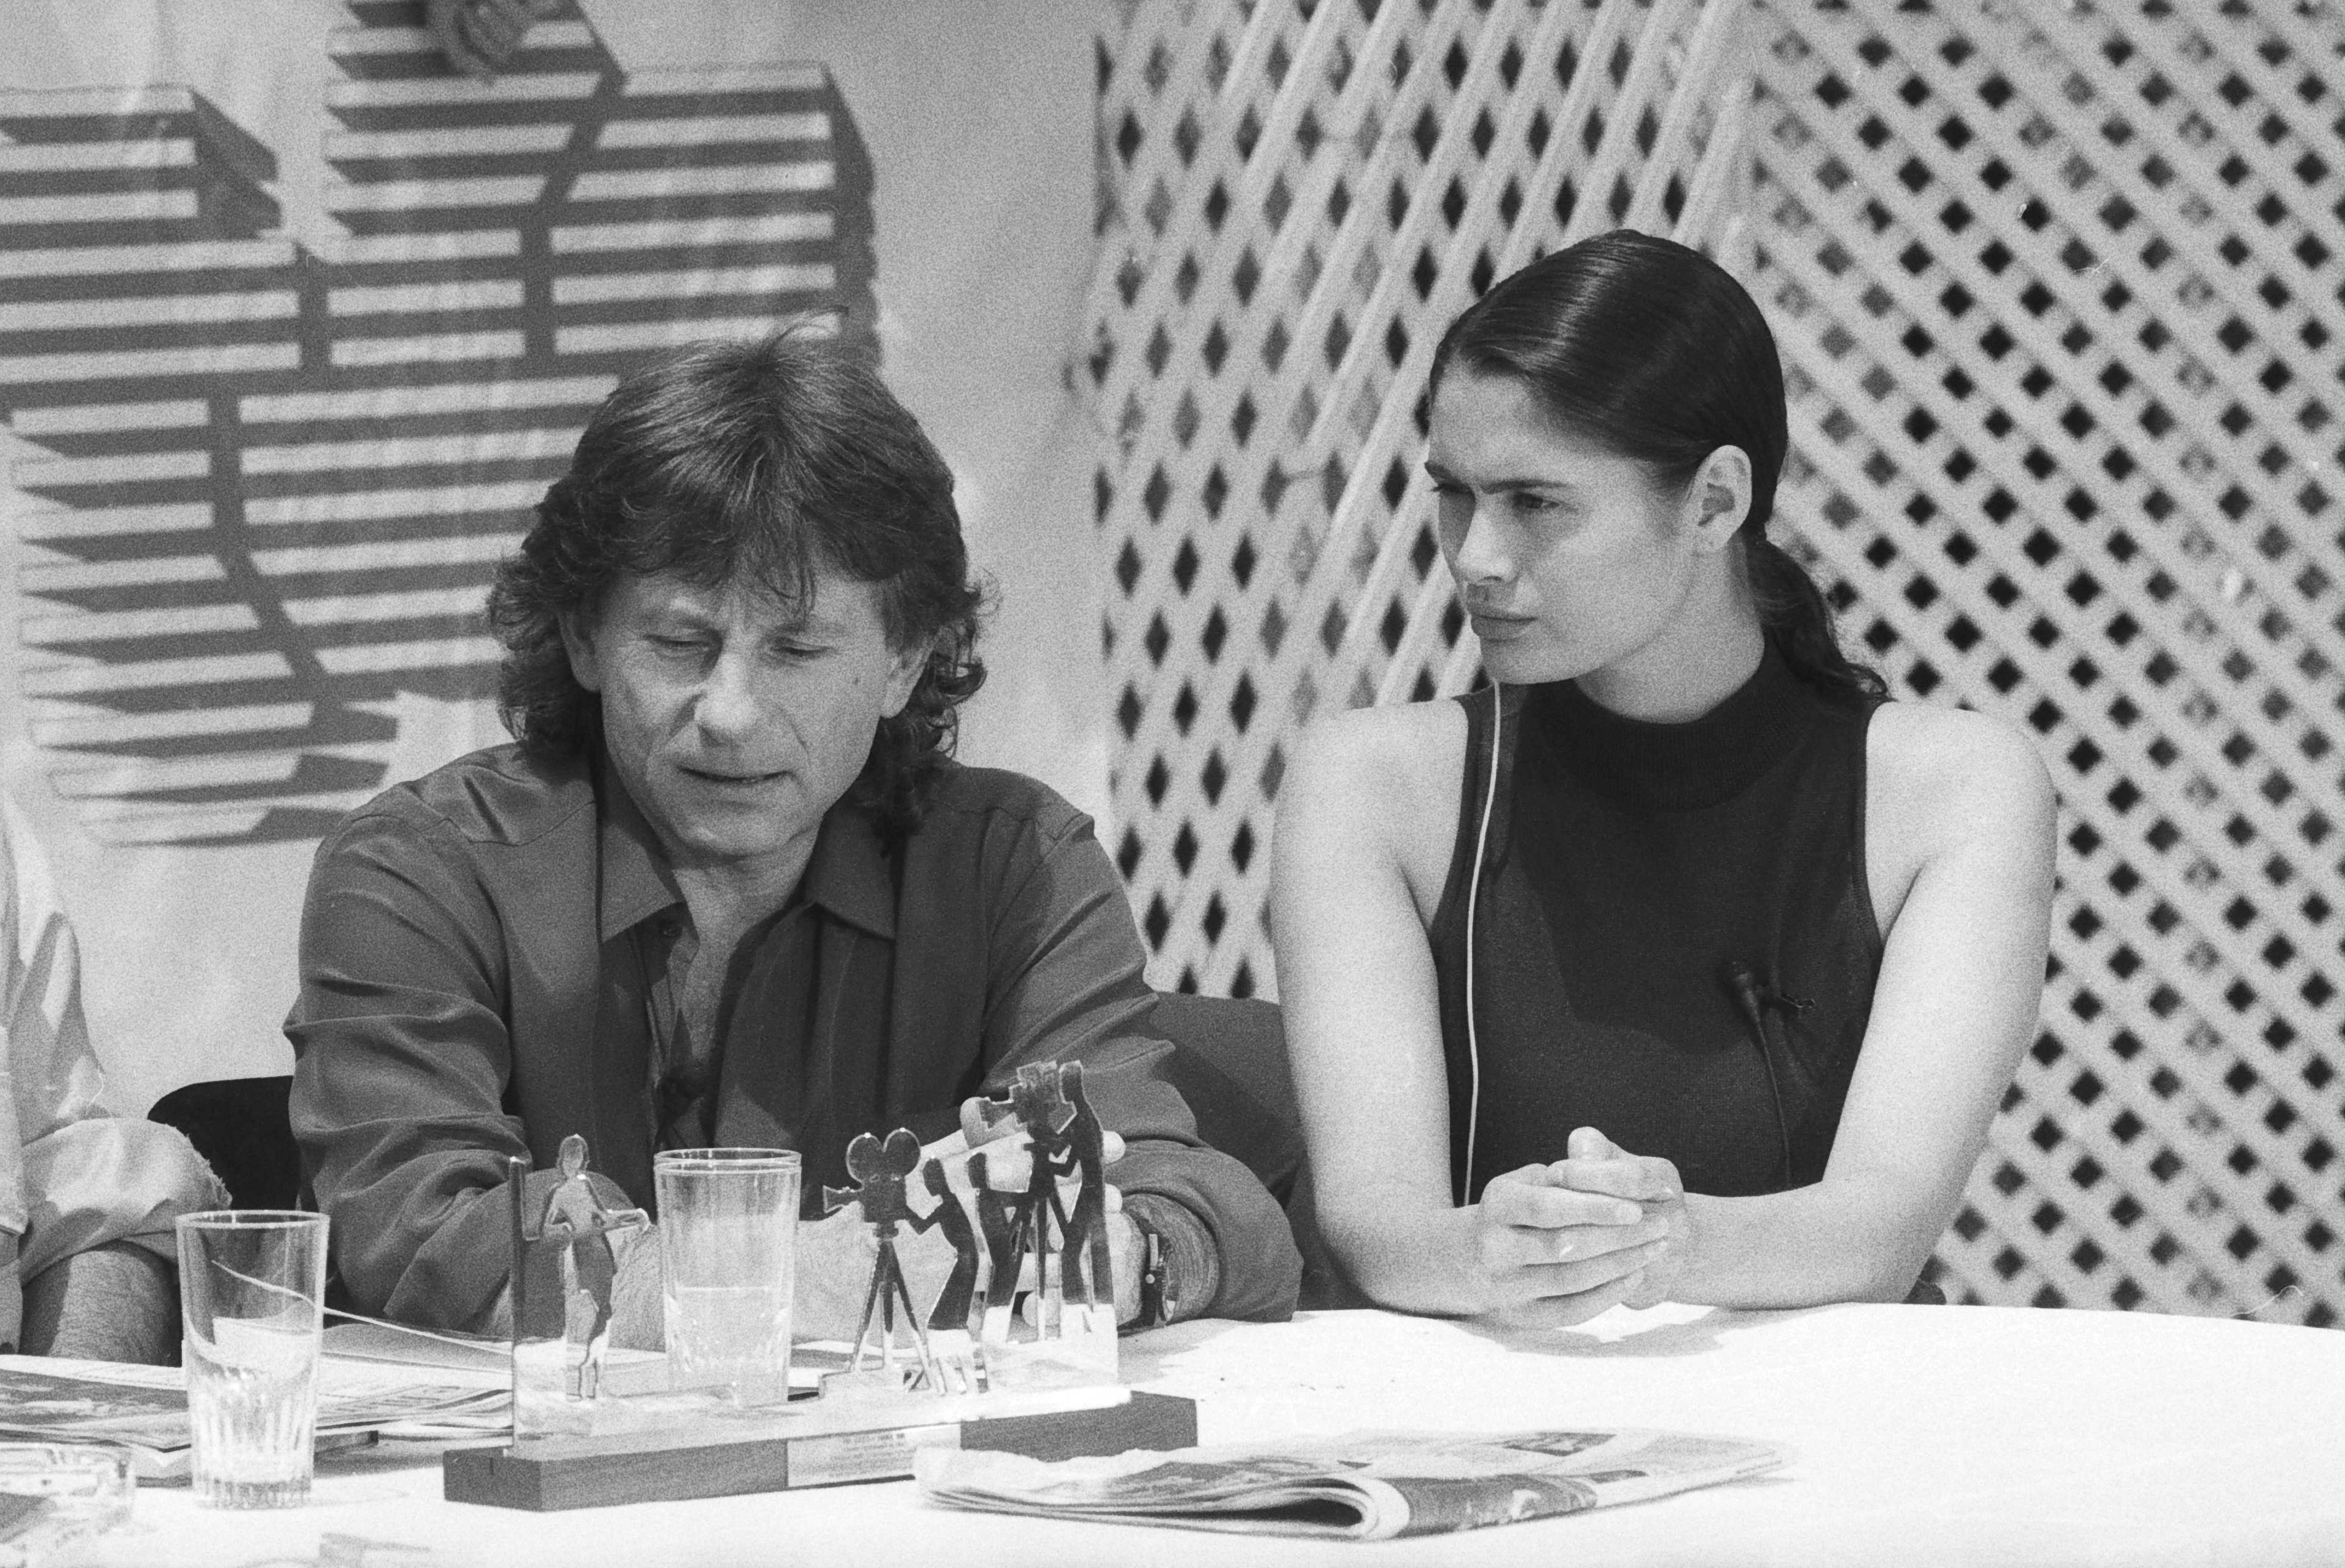 Roman Polanski and Charlotte Lewis at Cannes